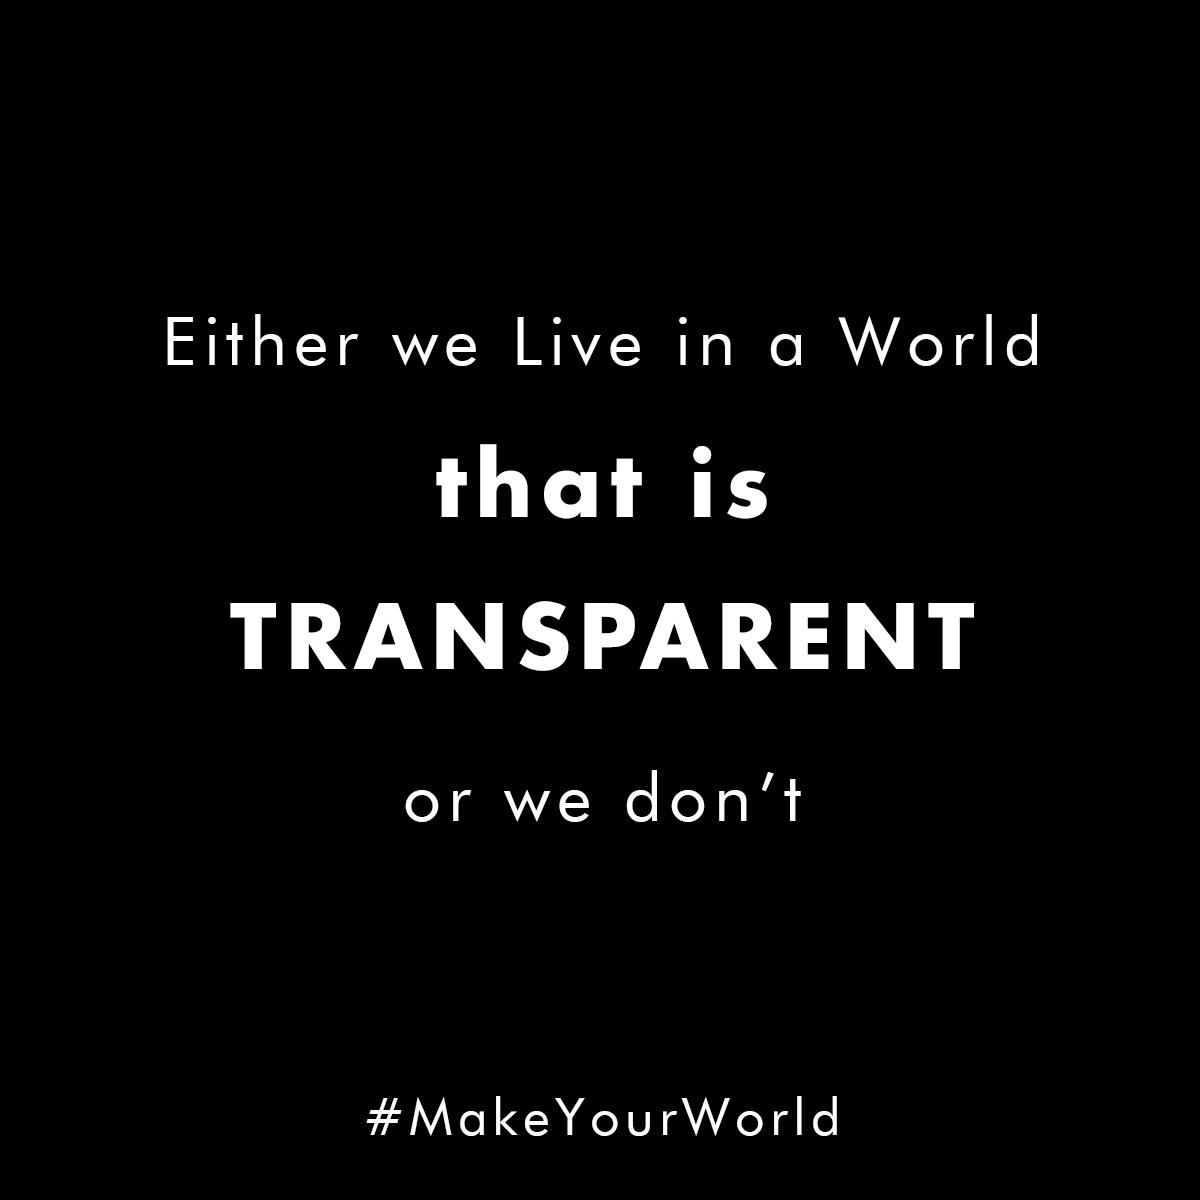 myw-12-transparent